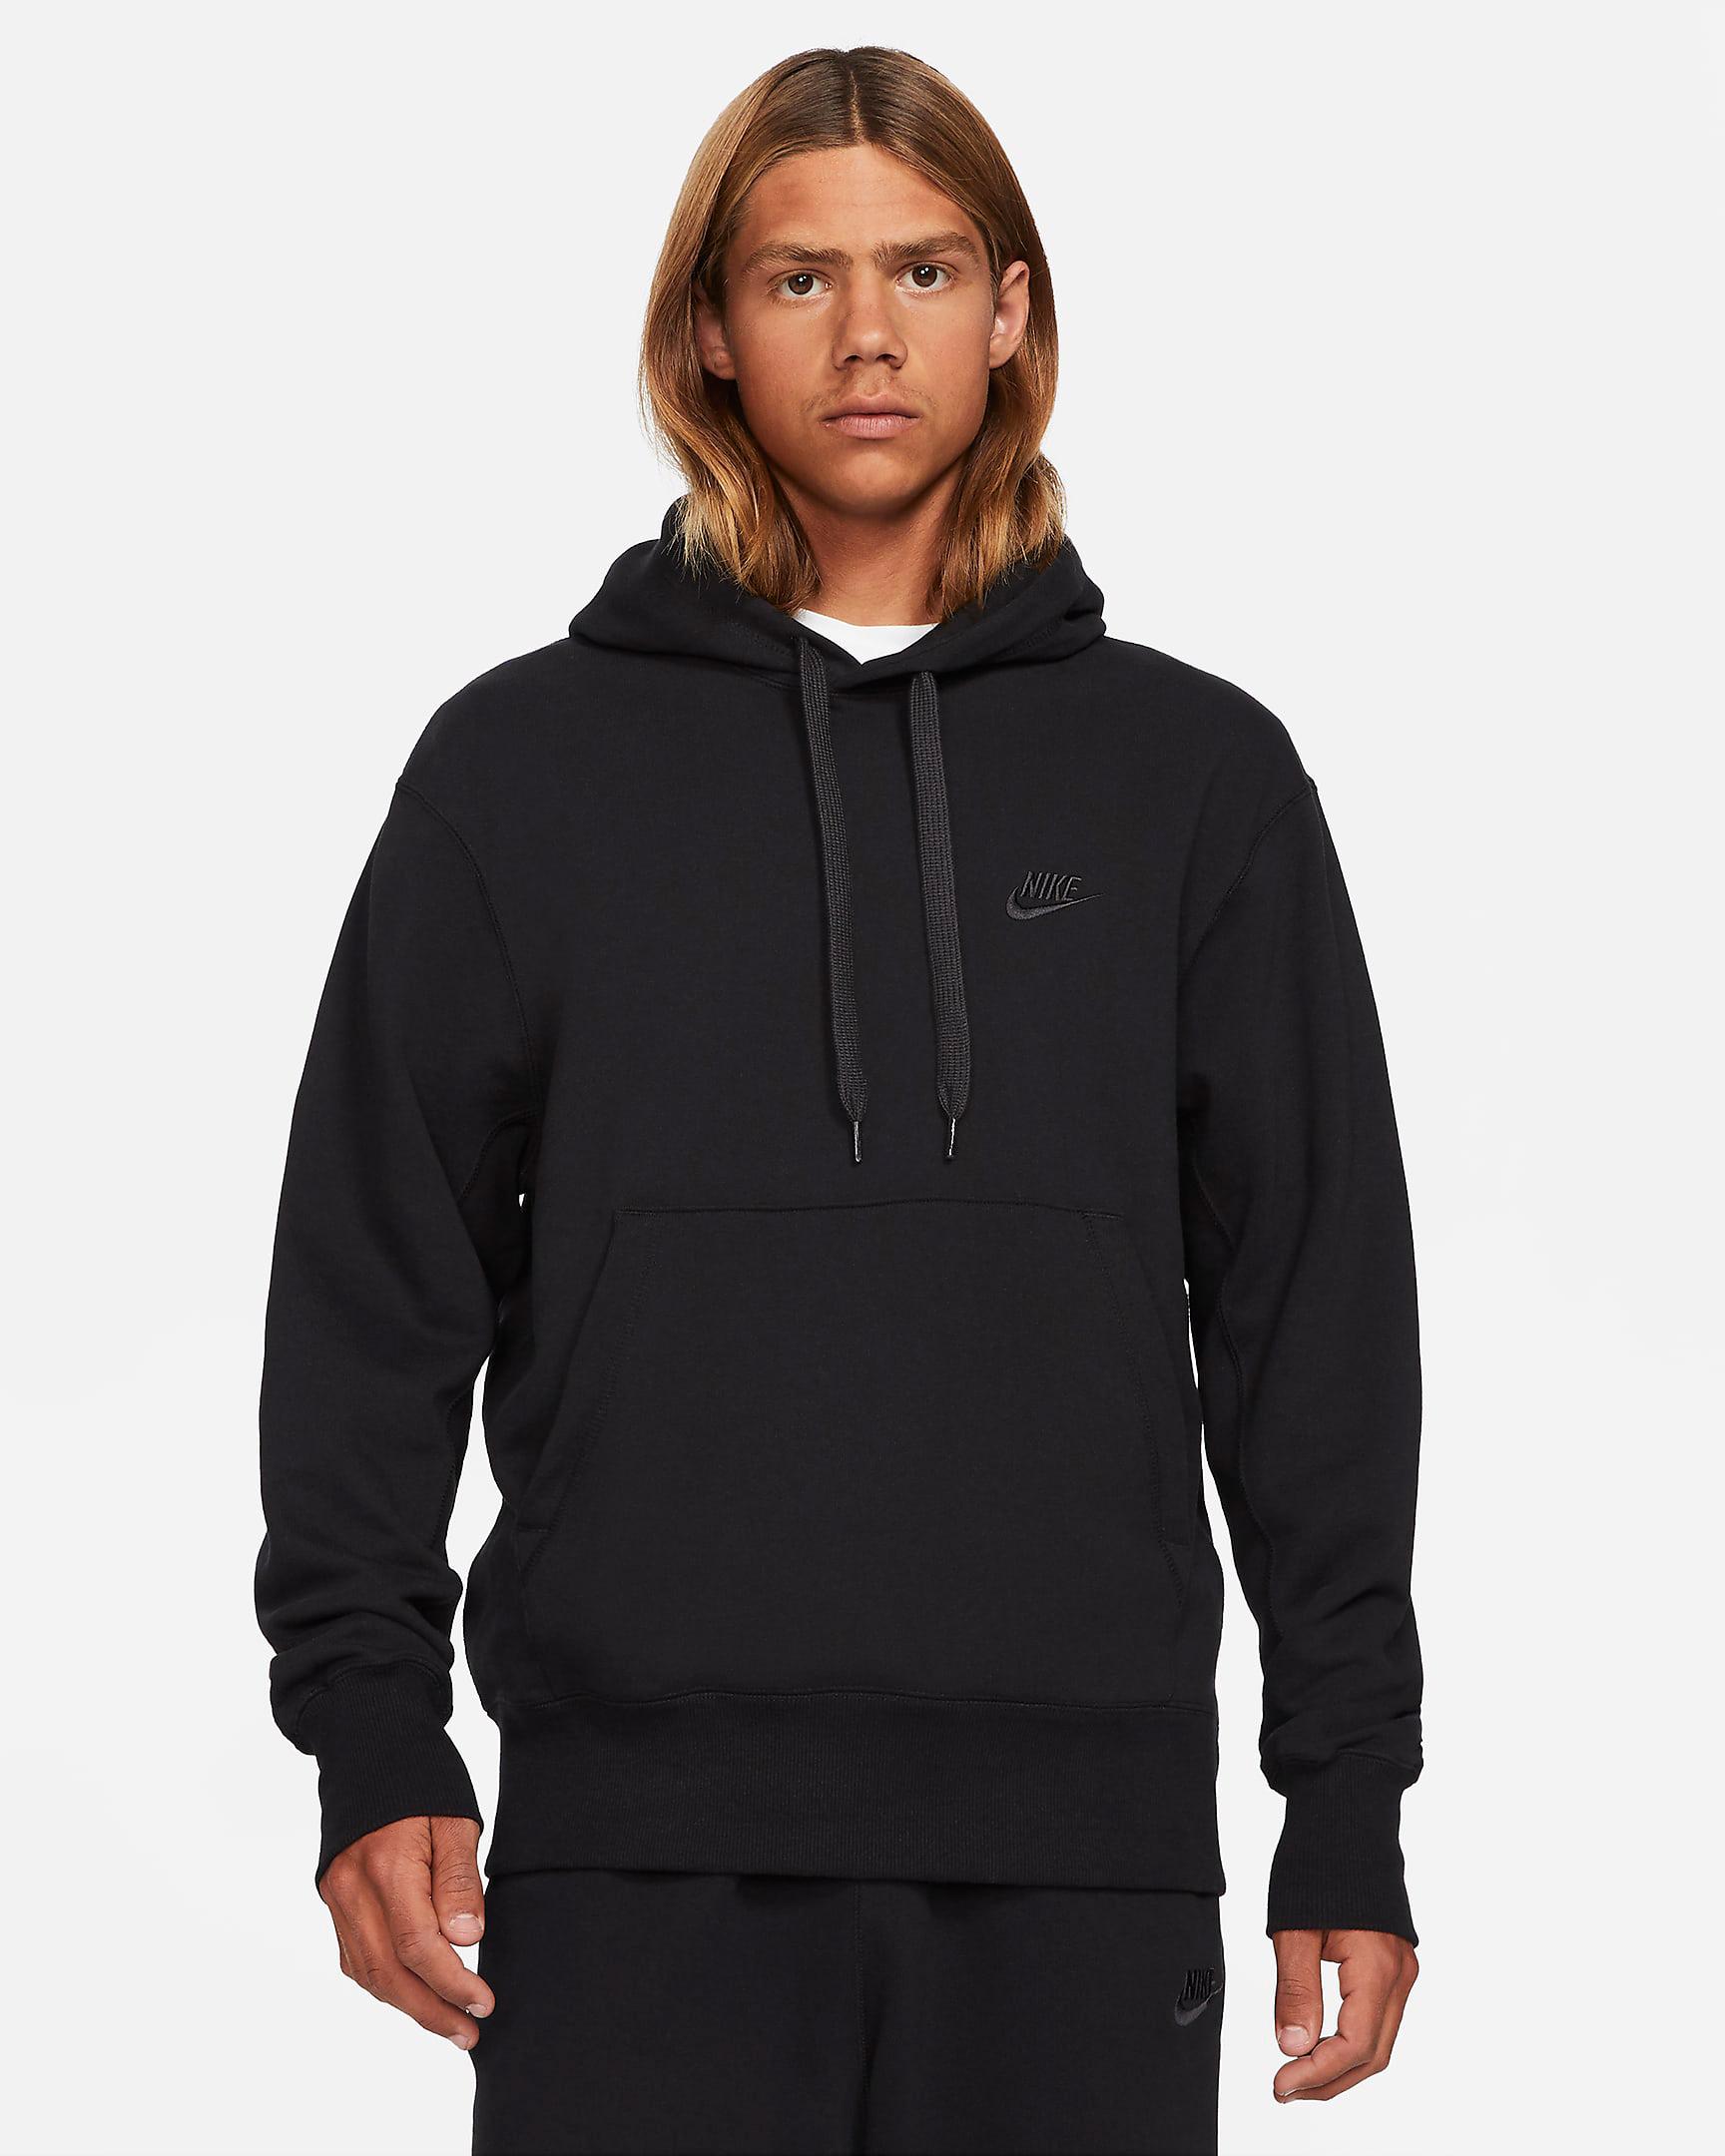 nike-sportswear-classic-black-hoodie